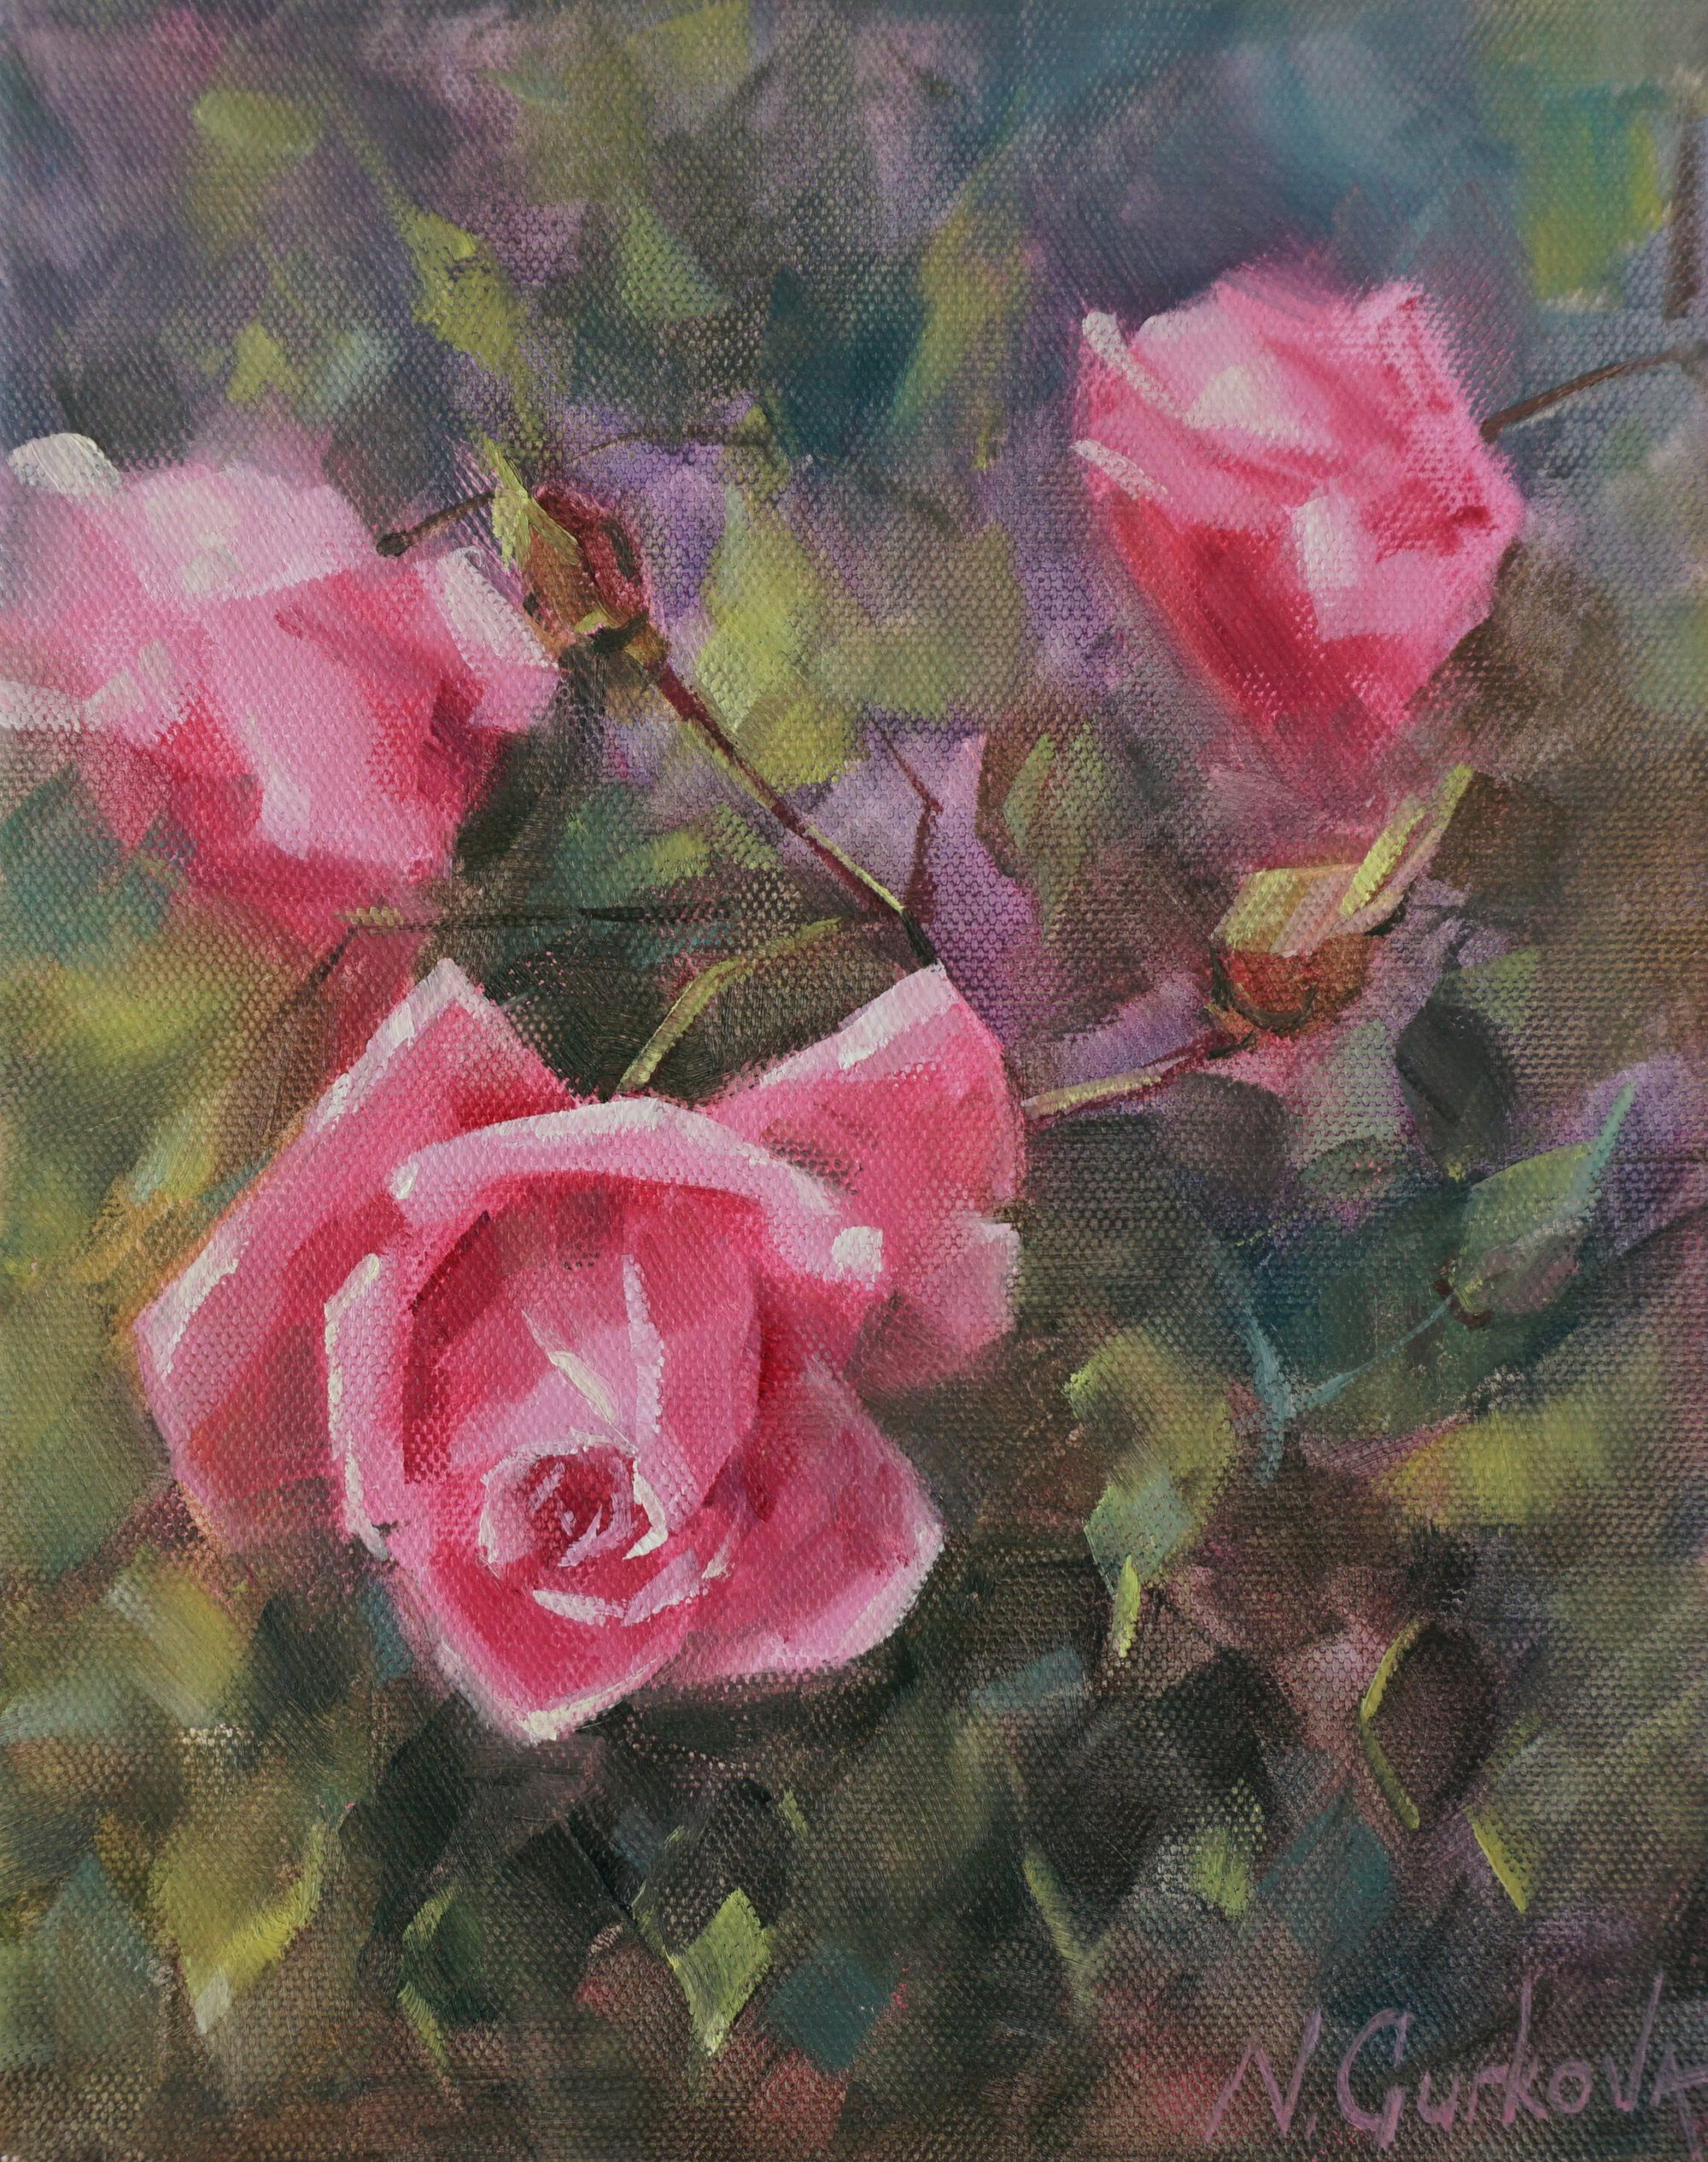 Pink Rose Flower Oil Painting Still Life Original Canvas Etsy In 2020 Floral Painting Oil Painting Flowers Flower Painting Canvas